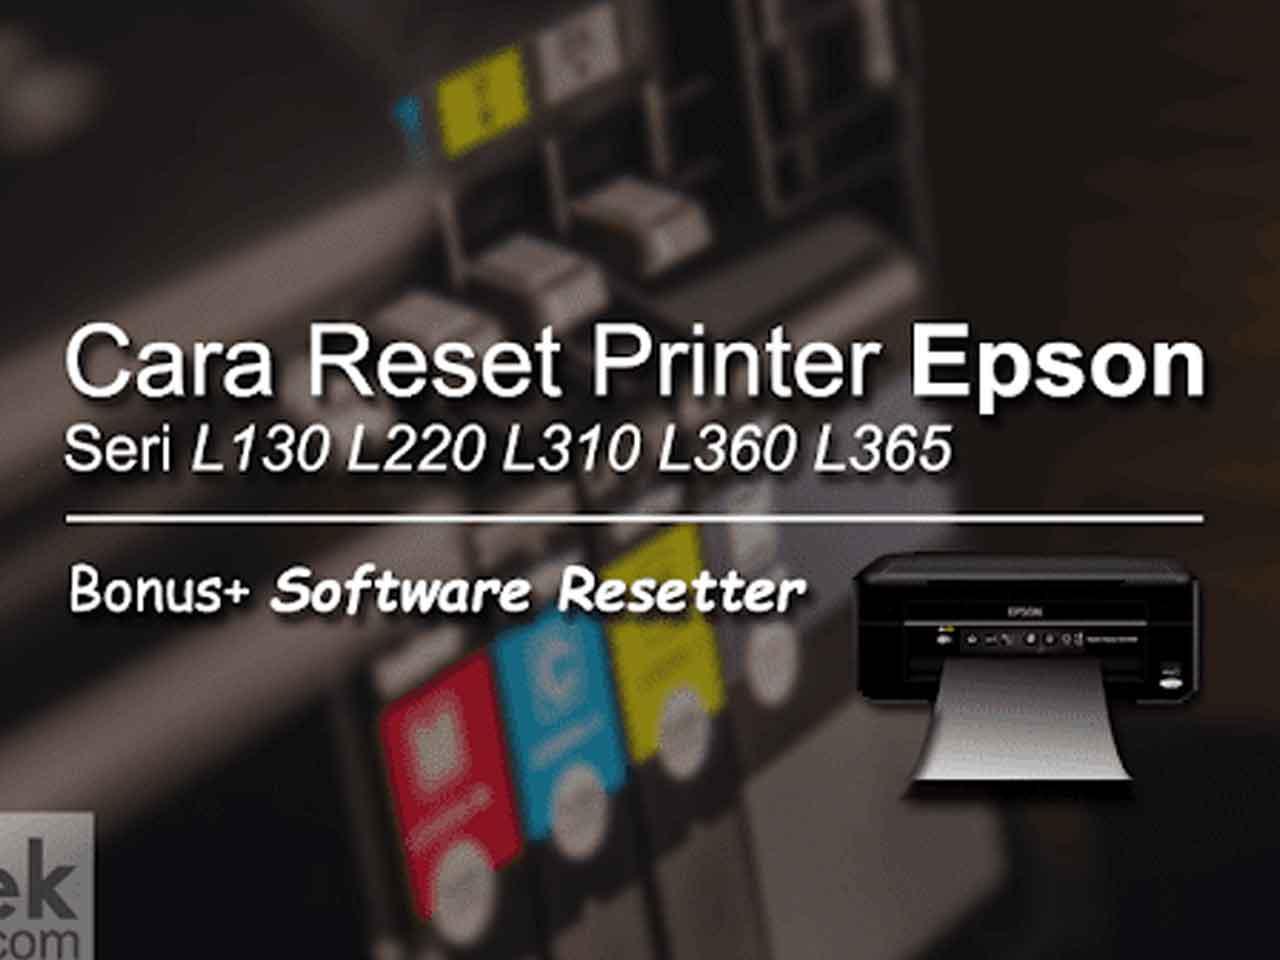 Cara Reset Printer Epson L130 L220 L310 L360 L365 Menggunakan Software Resetter